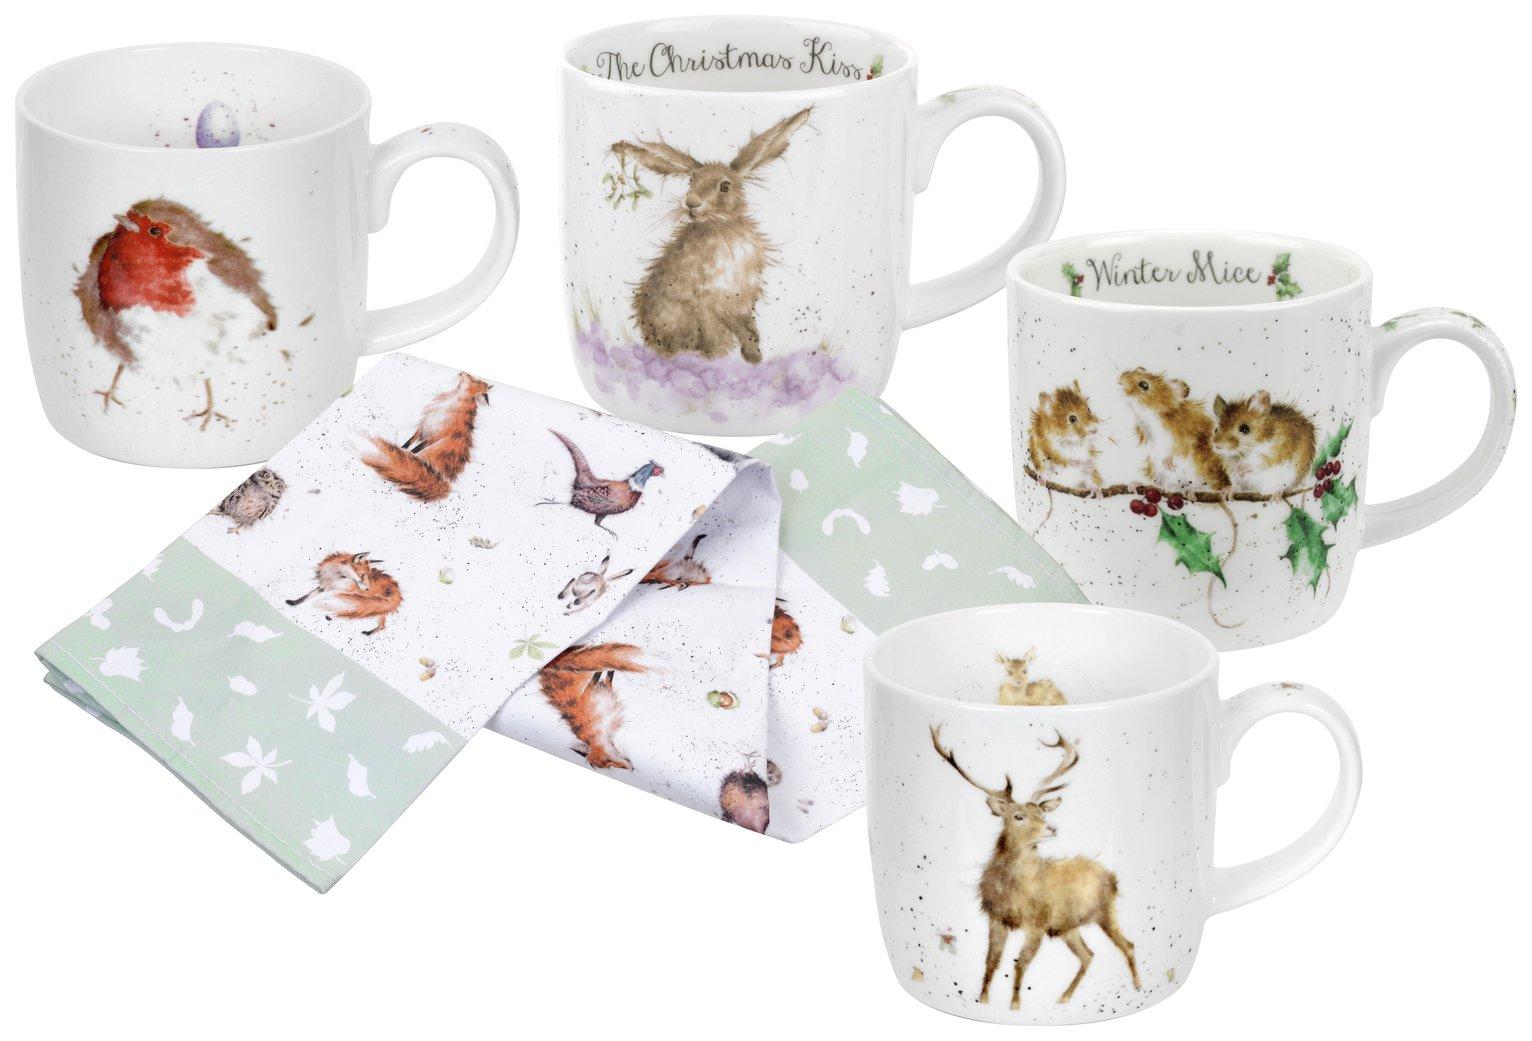 Royal Worcester Set of 4 Wrendale Christmas Mugs & Tea Towel review